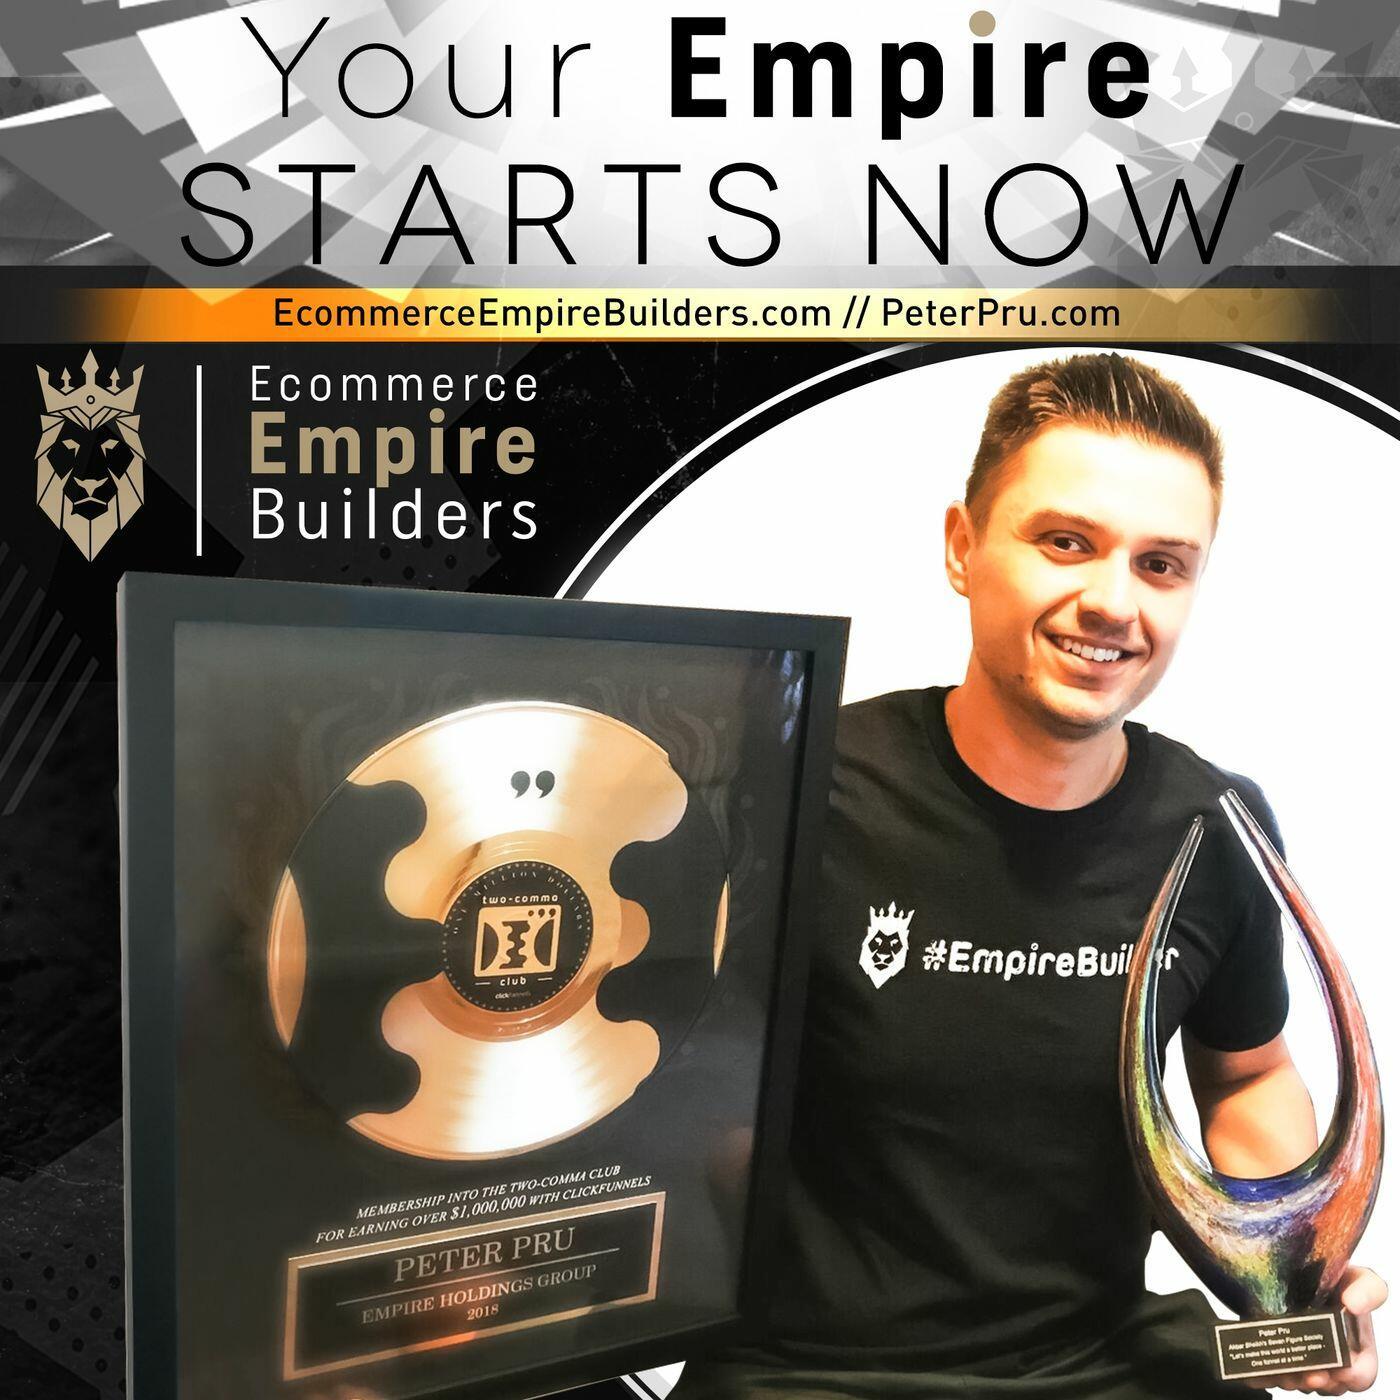 Ecommerce Empire Builders